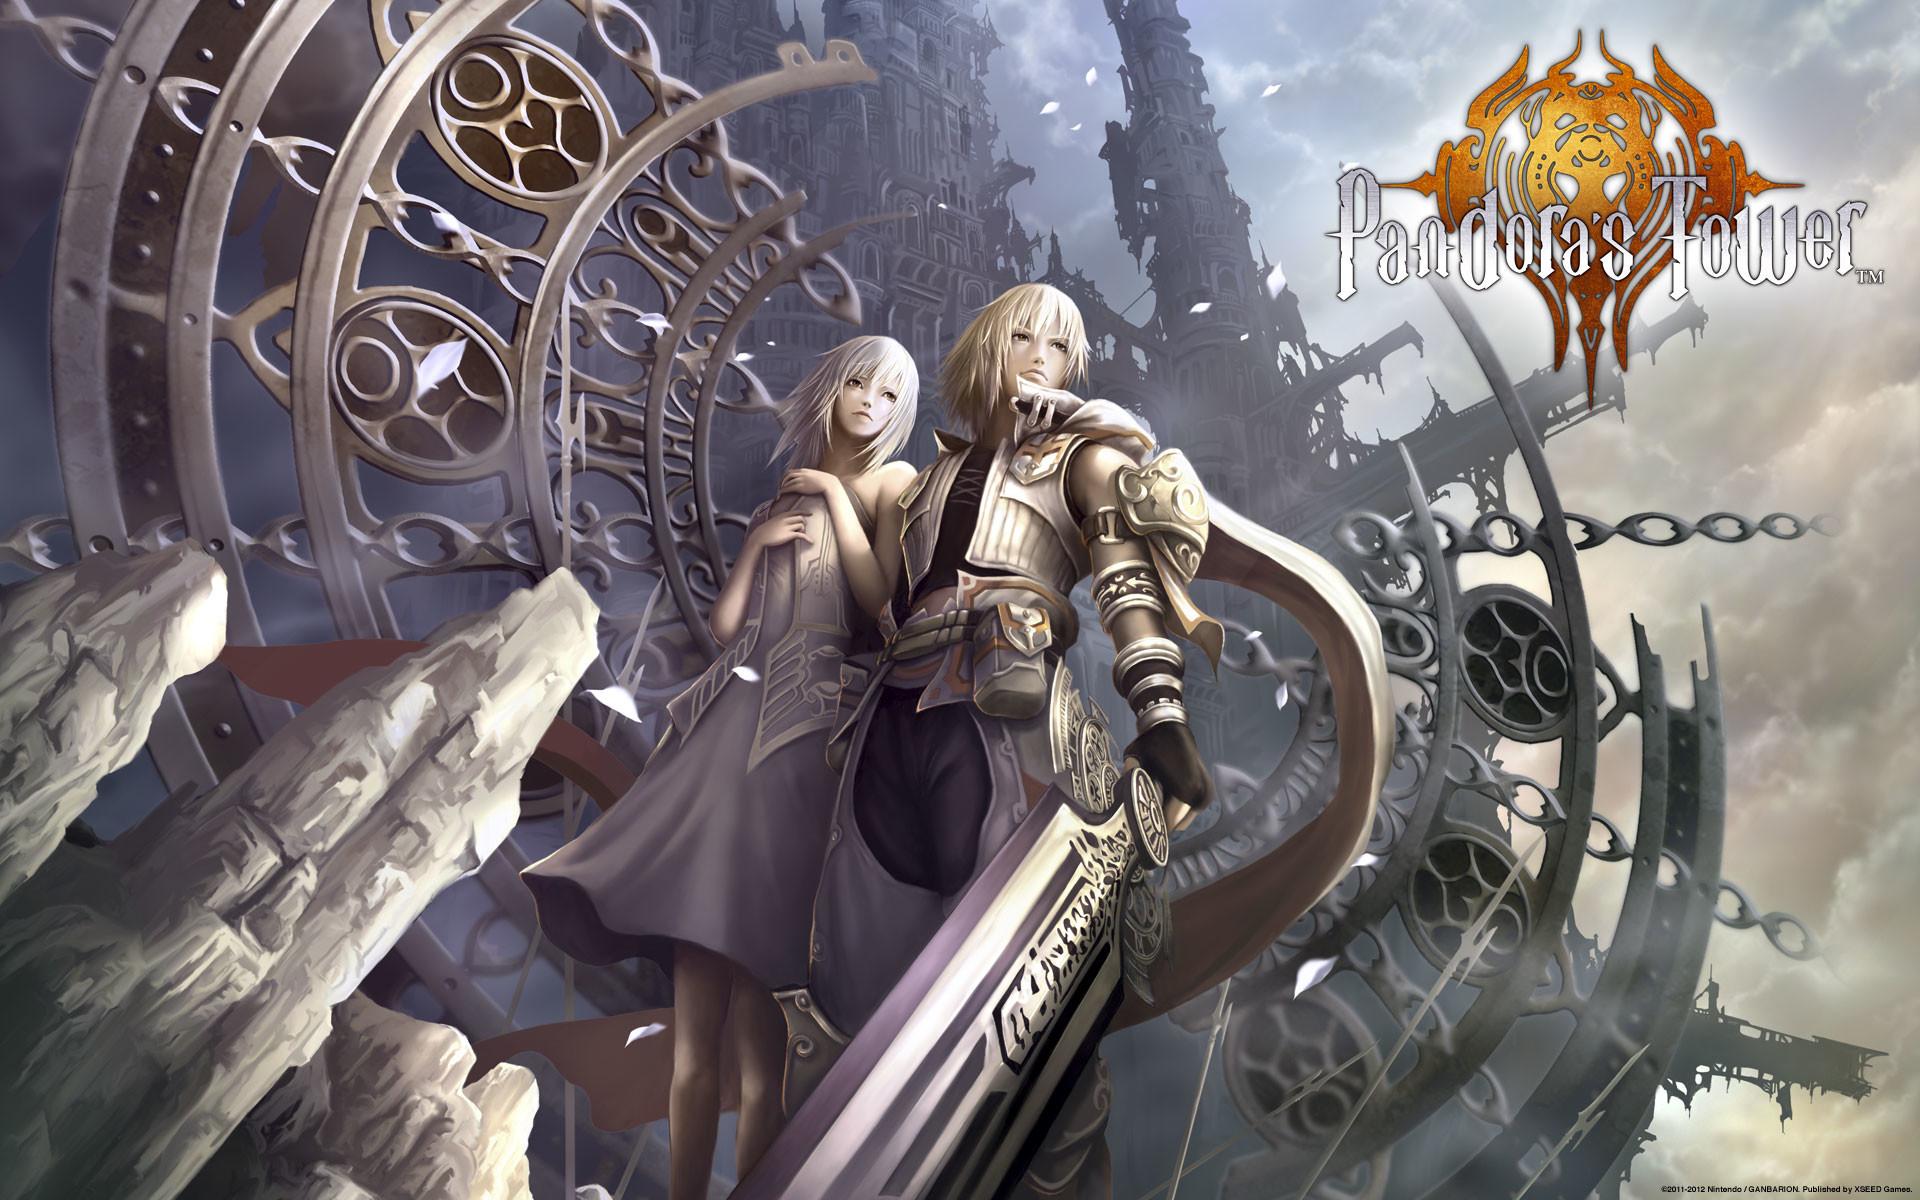 PANDORAS TOWER fantasy anime warrior poster d wallpaper      225170   WallpaperUP